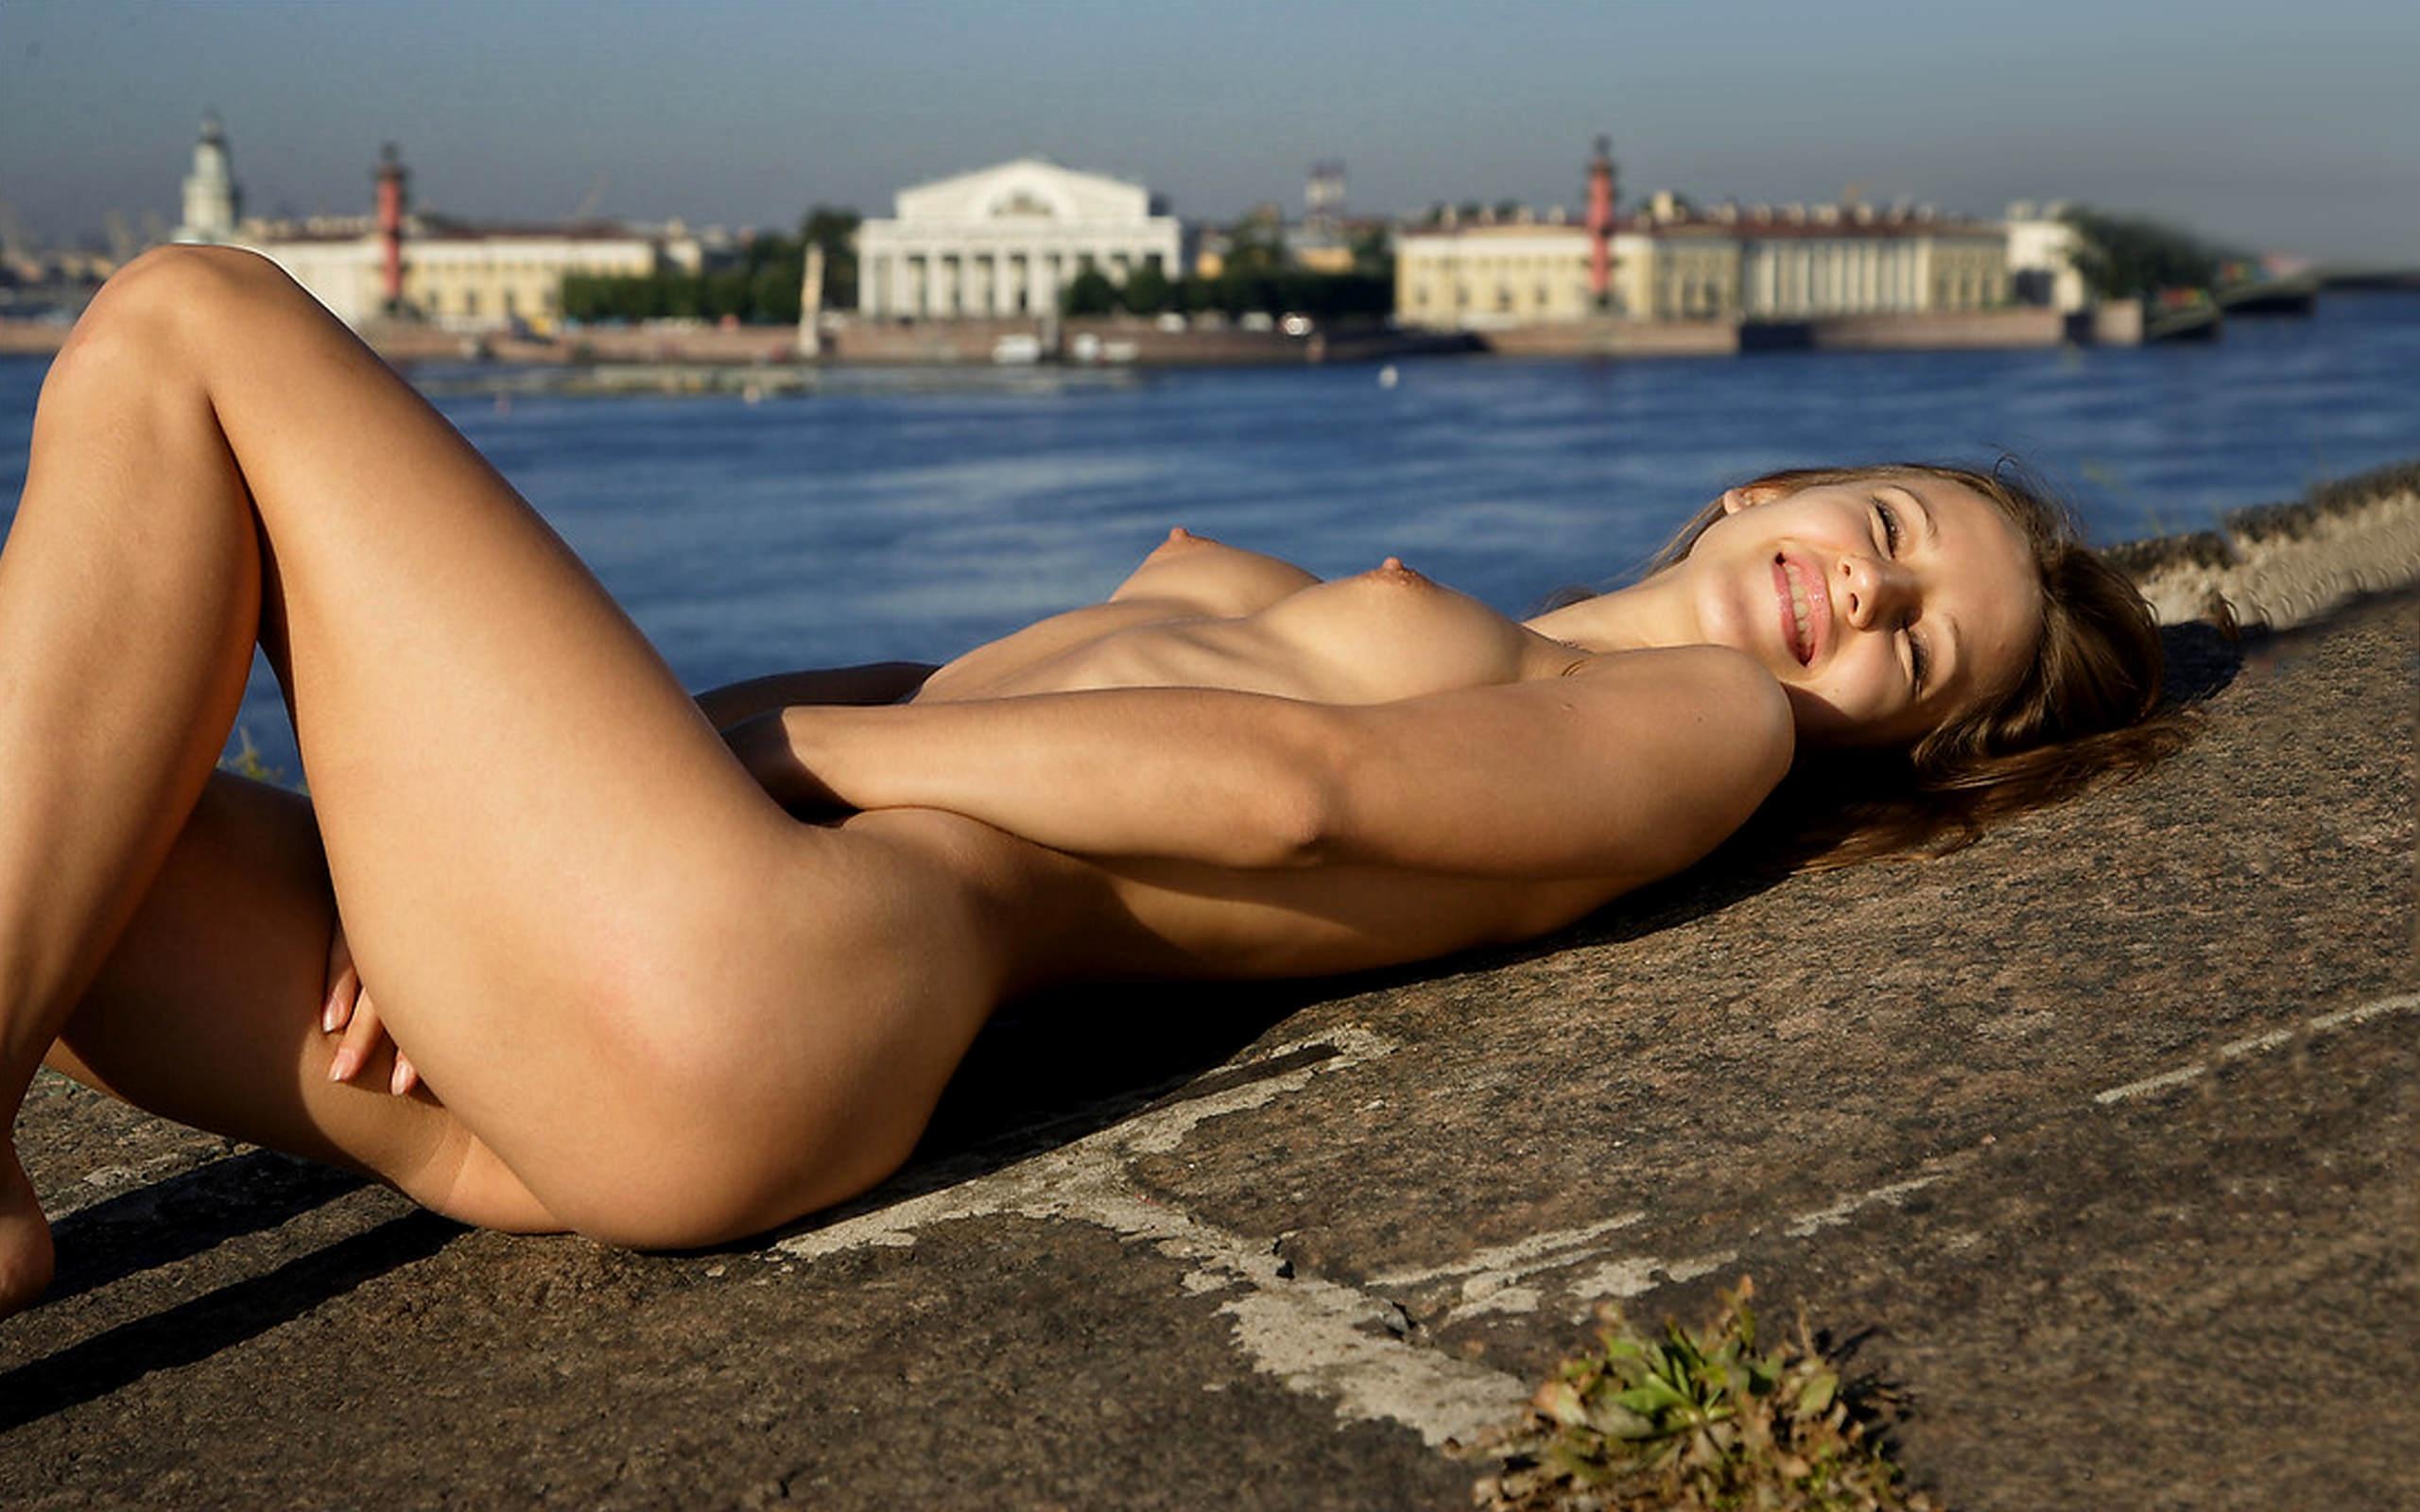 Classy blonde girl gets naked in st petersburg hotel